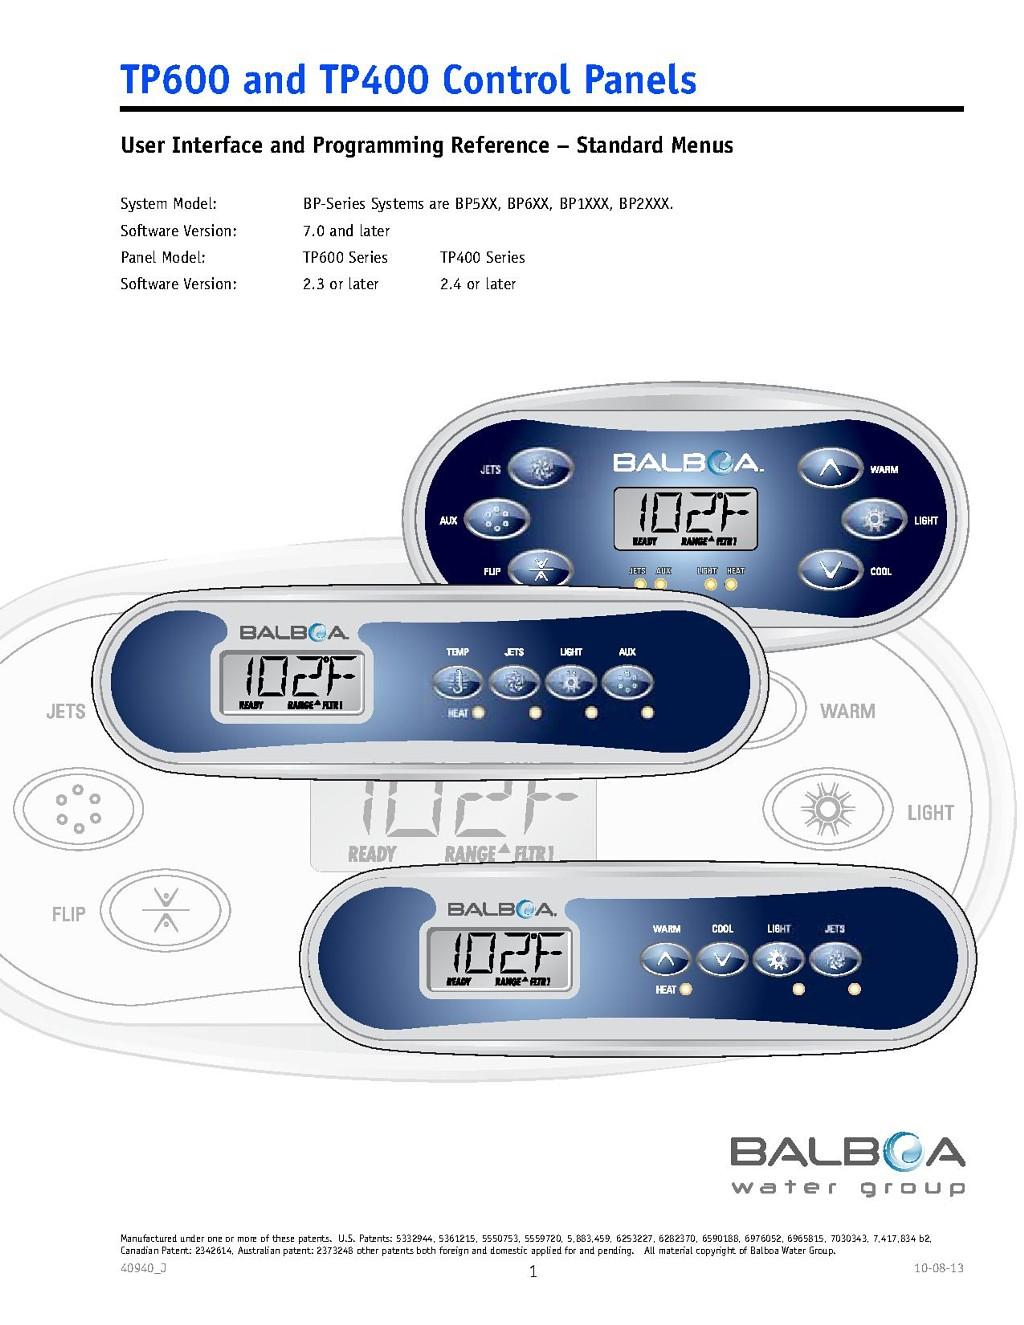 swimspa aquaclear balboa tp600 manual rh timeoutspas com sunbelt swim spa manual Artesian Spas Brand